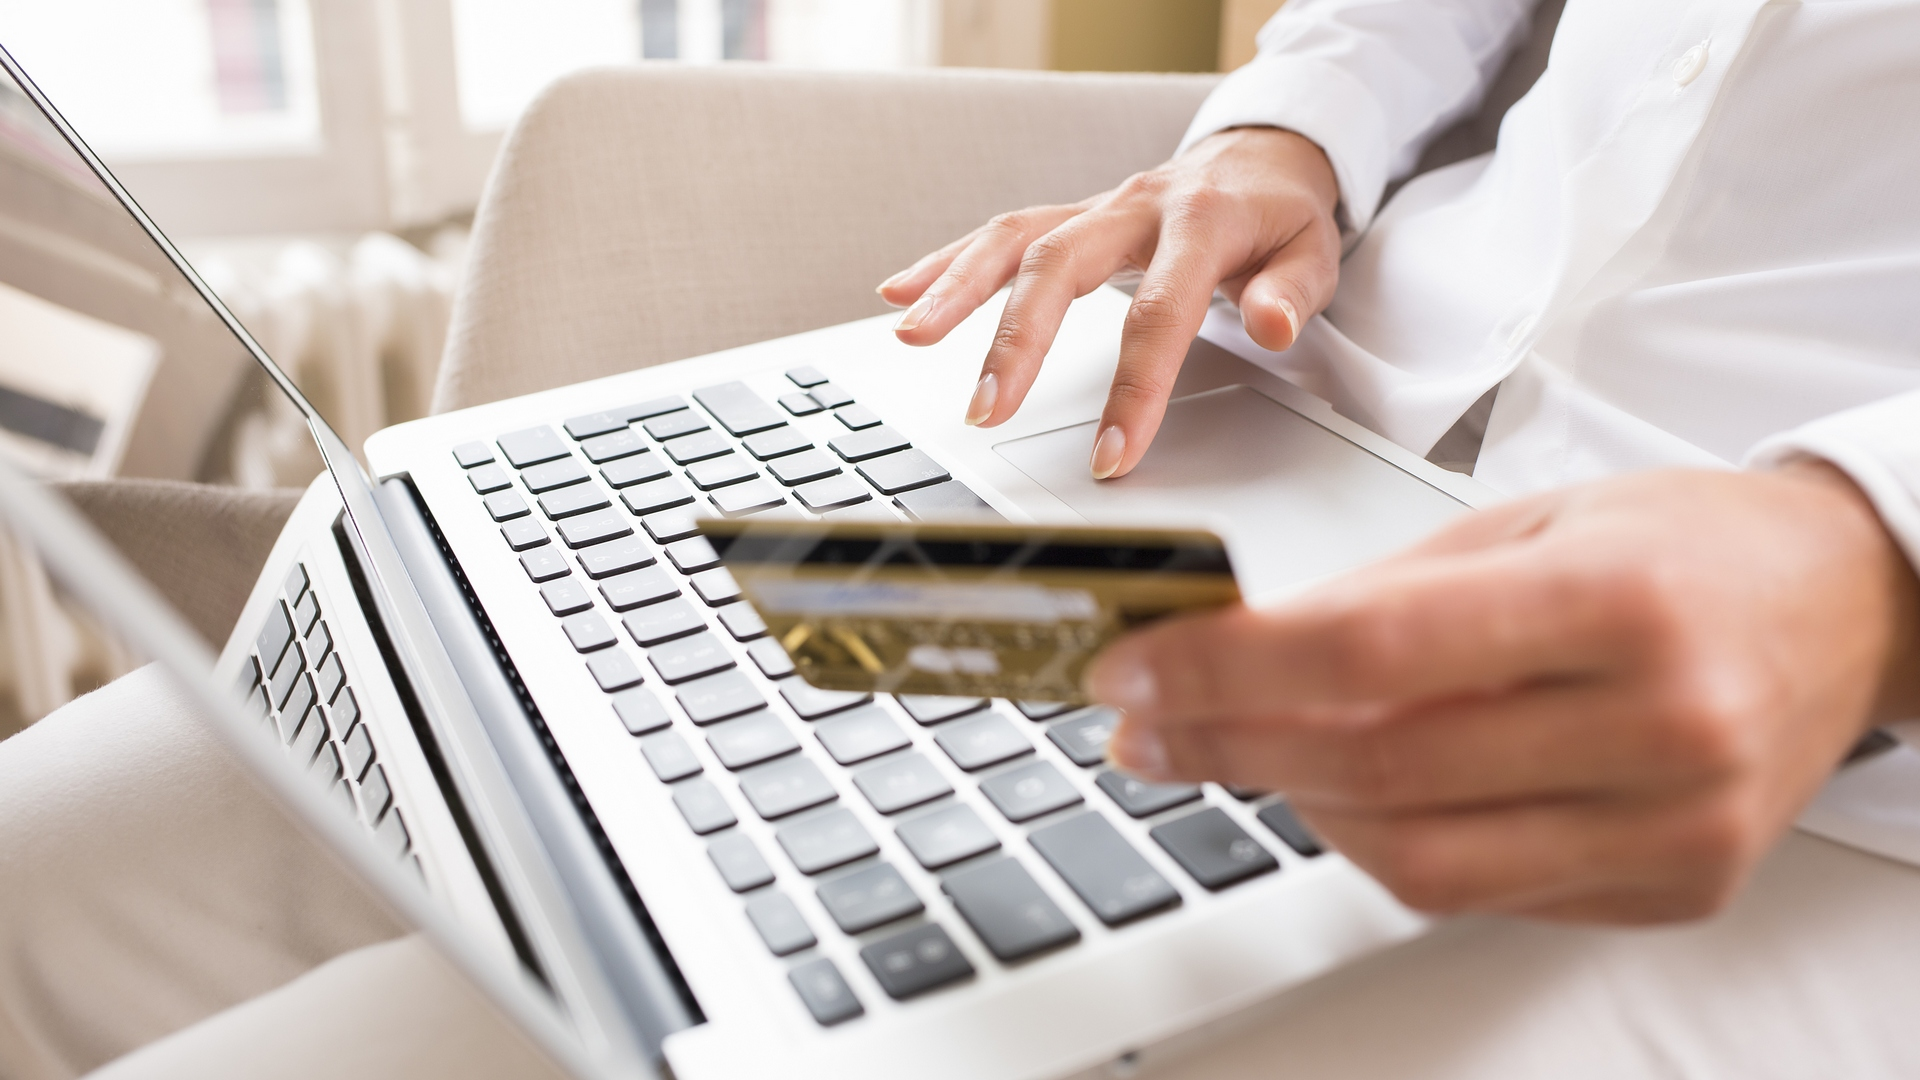 Микрокредиты онлайн в Казахстане - ДоПолучки.кз